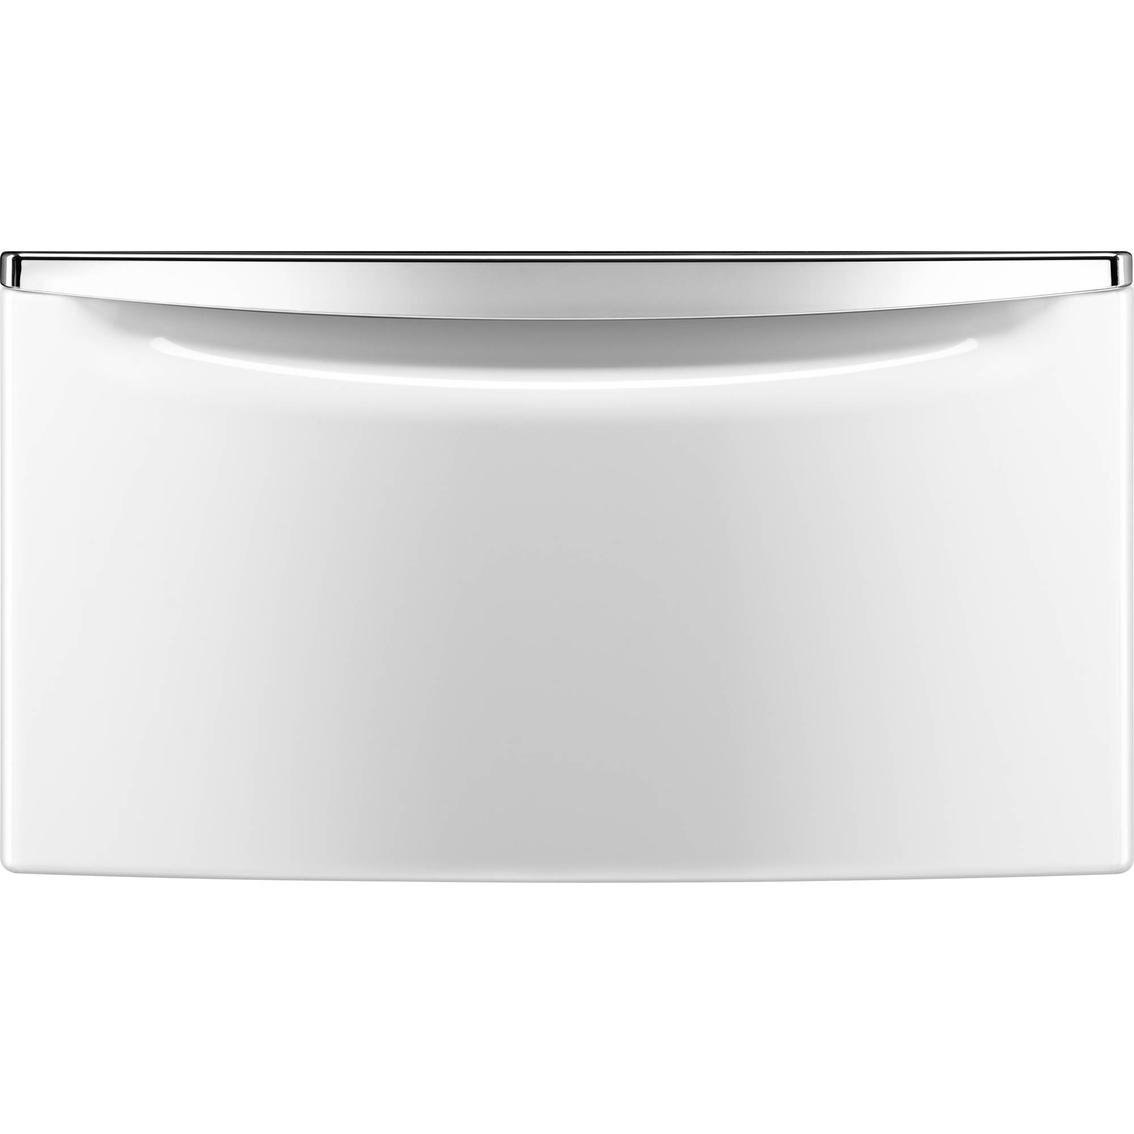 oem maytag pedestal products whirlpool washer genuine dryer pad